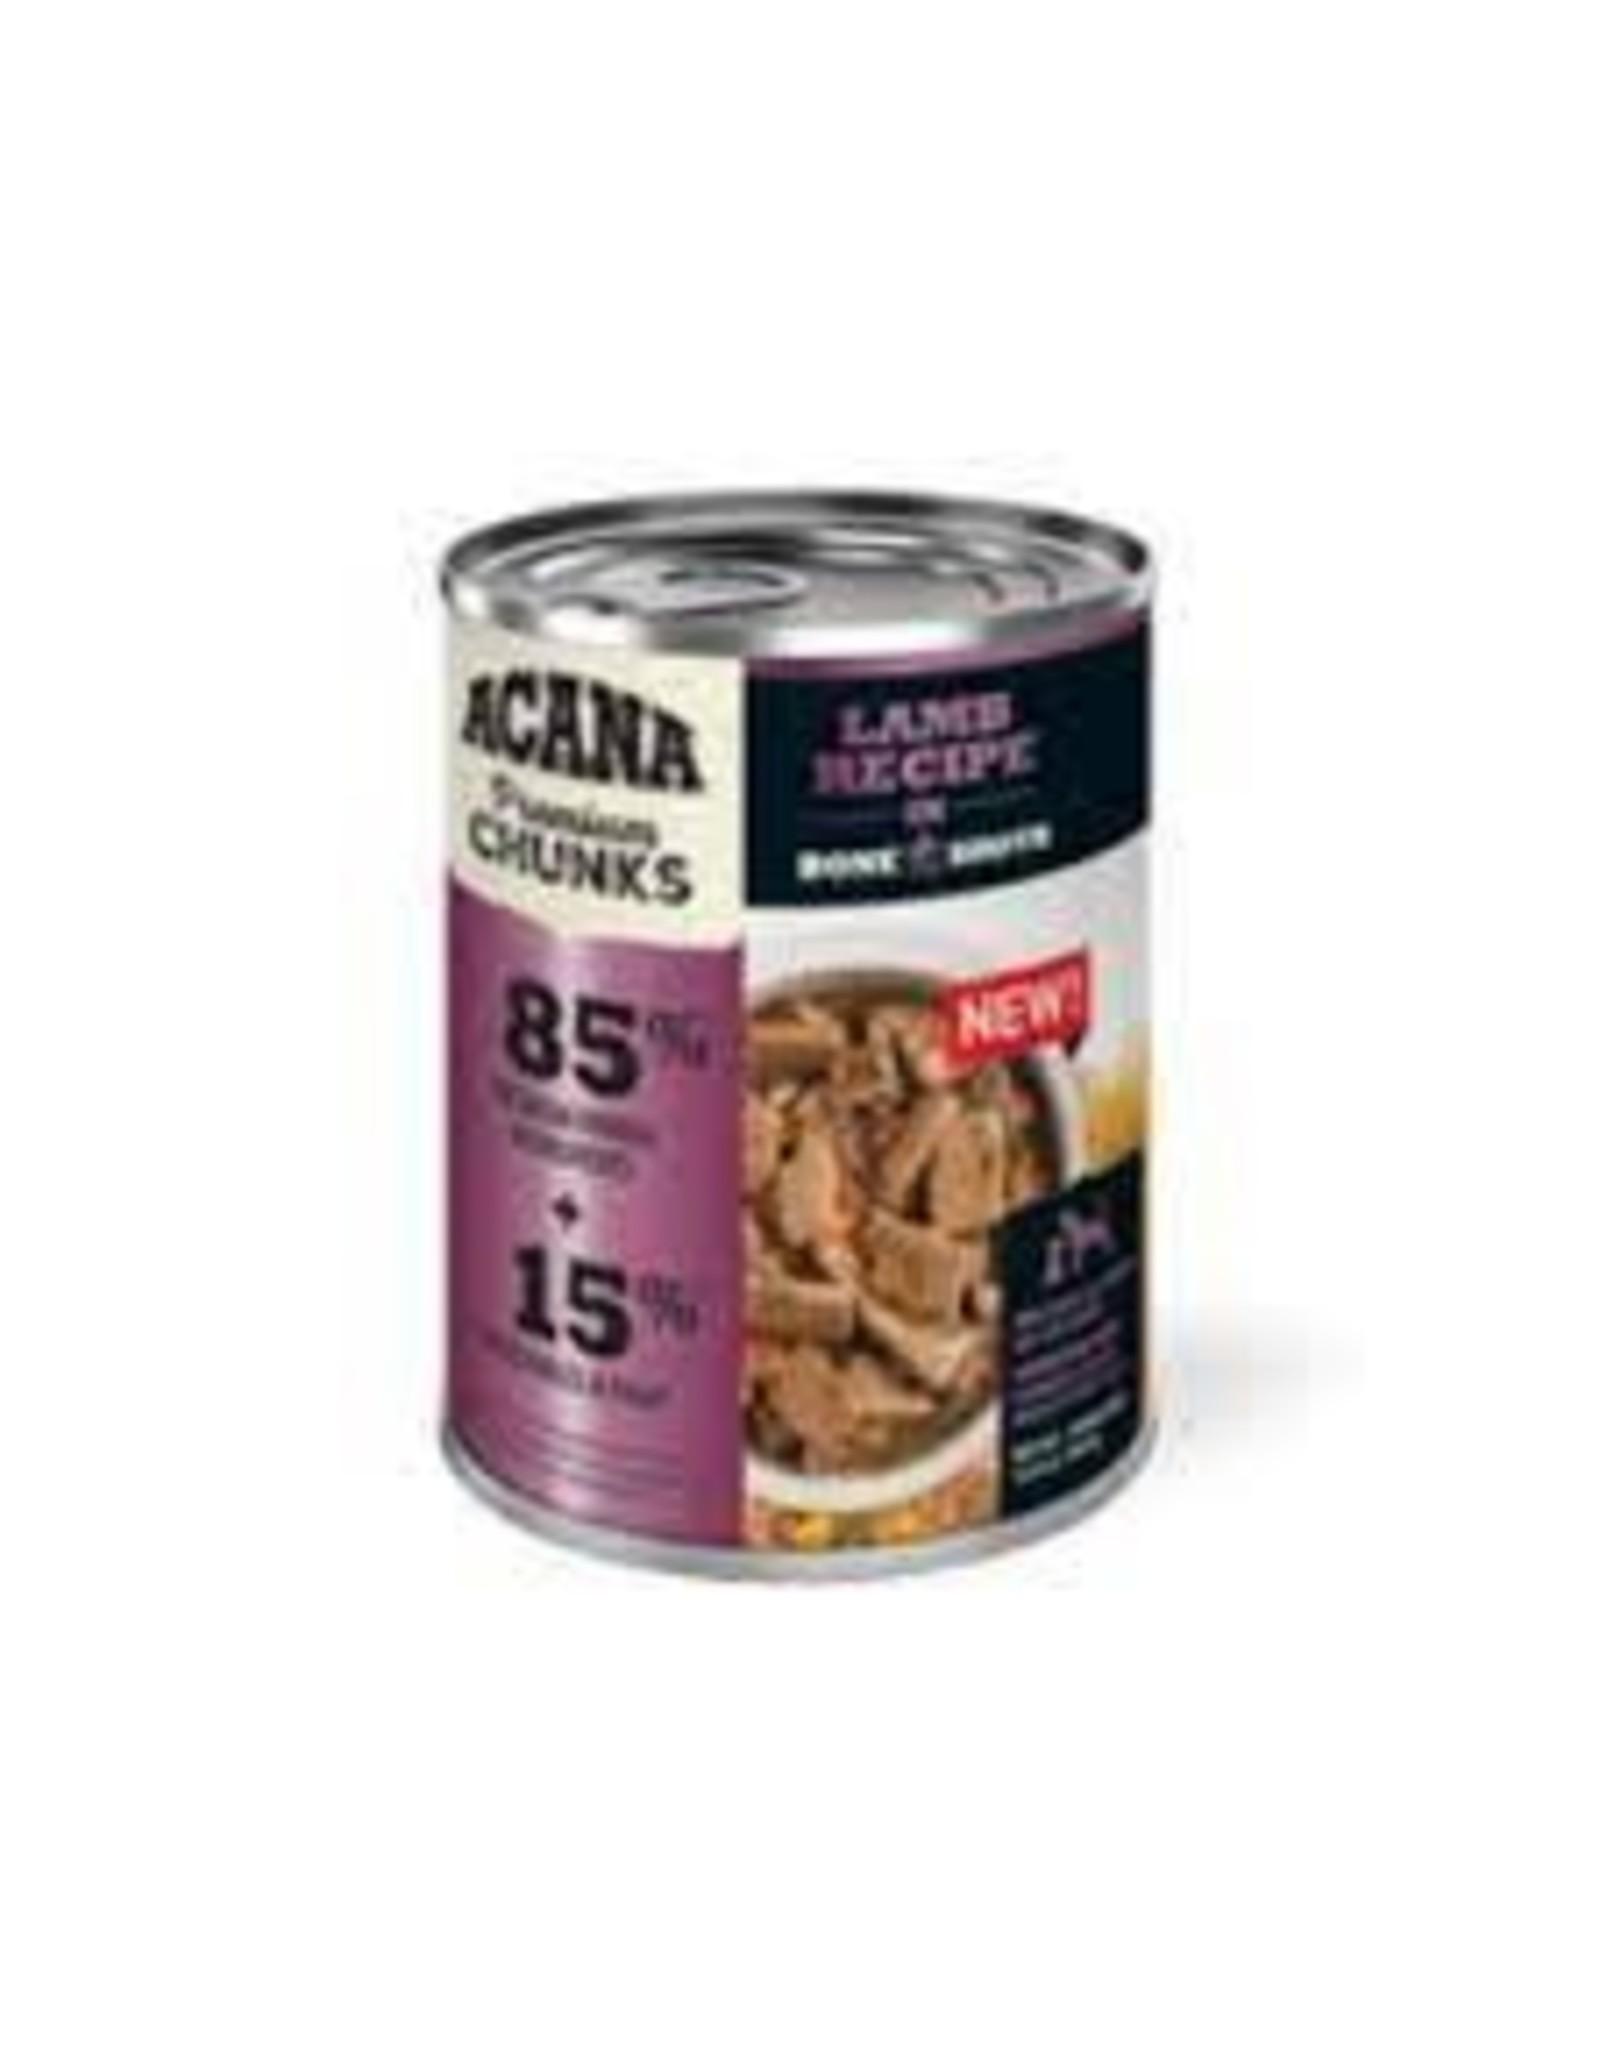 Acana Acana Lamb Recipe in Bone Broth, 12.8oz